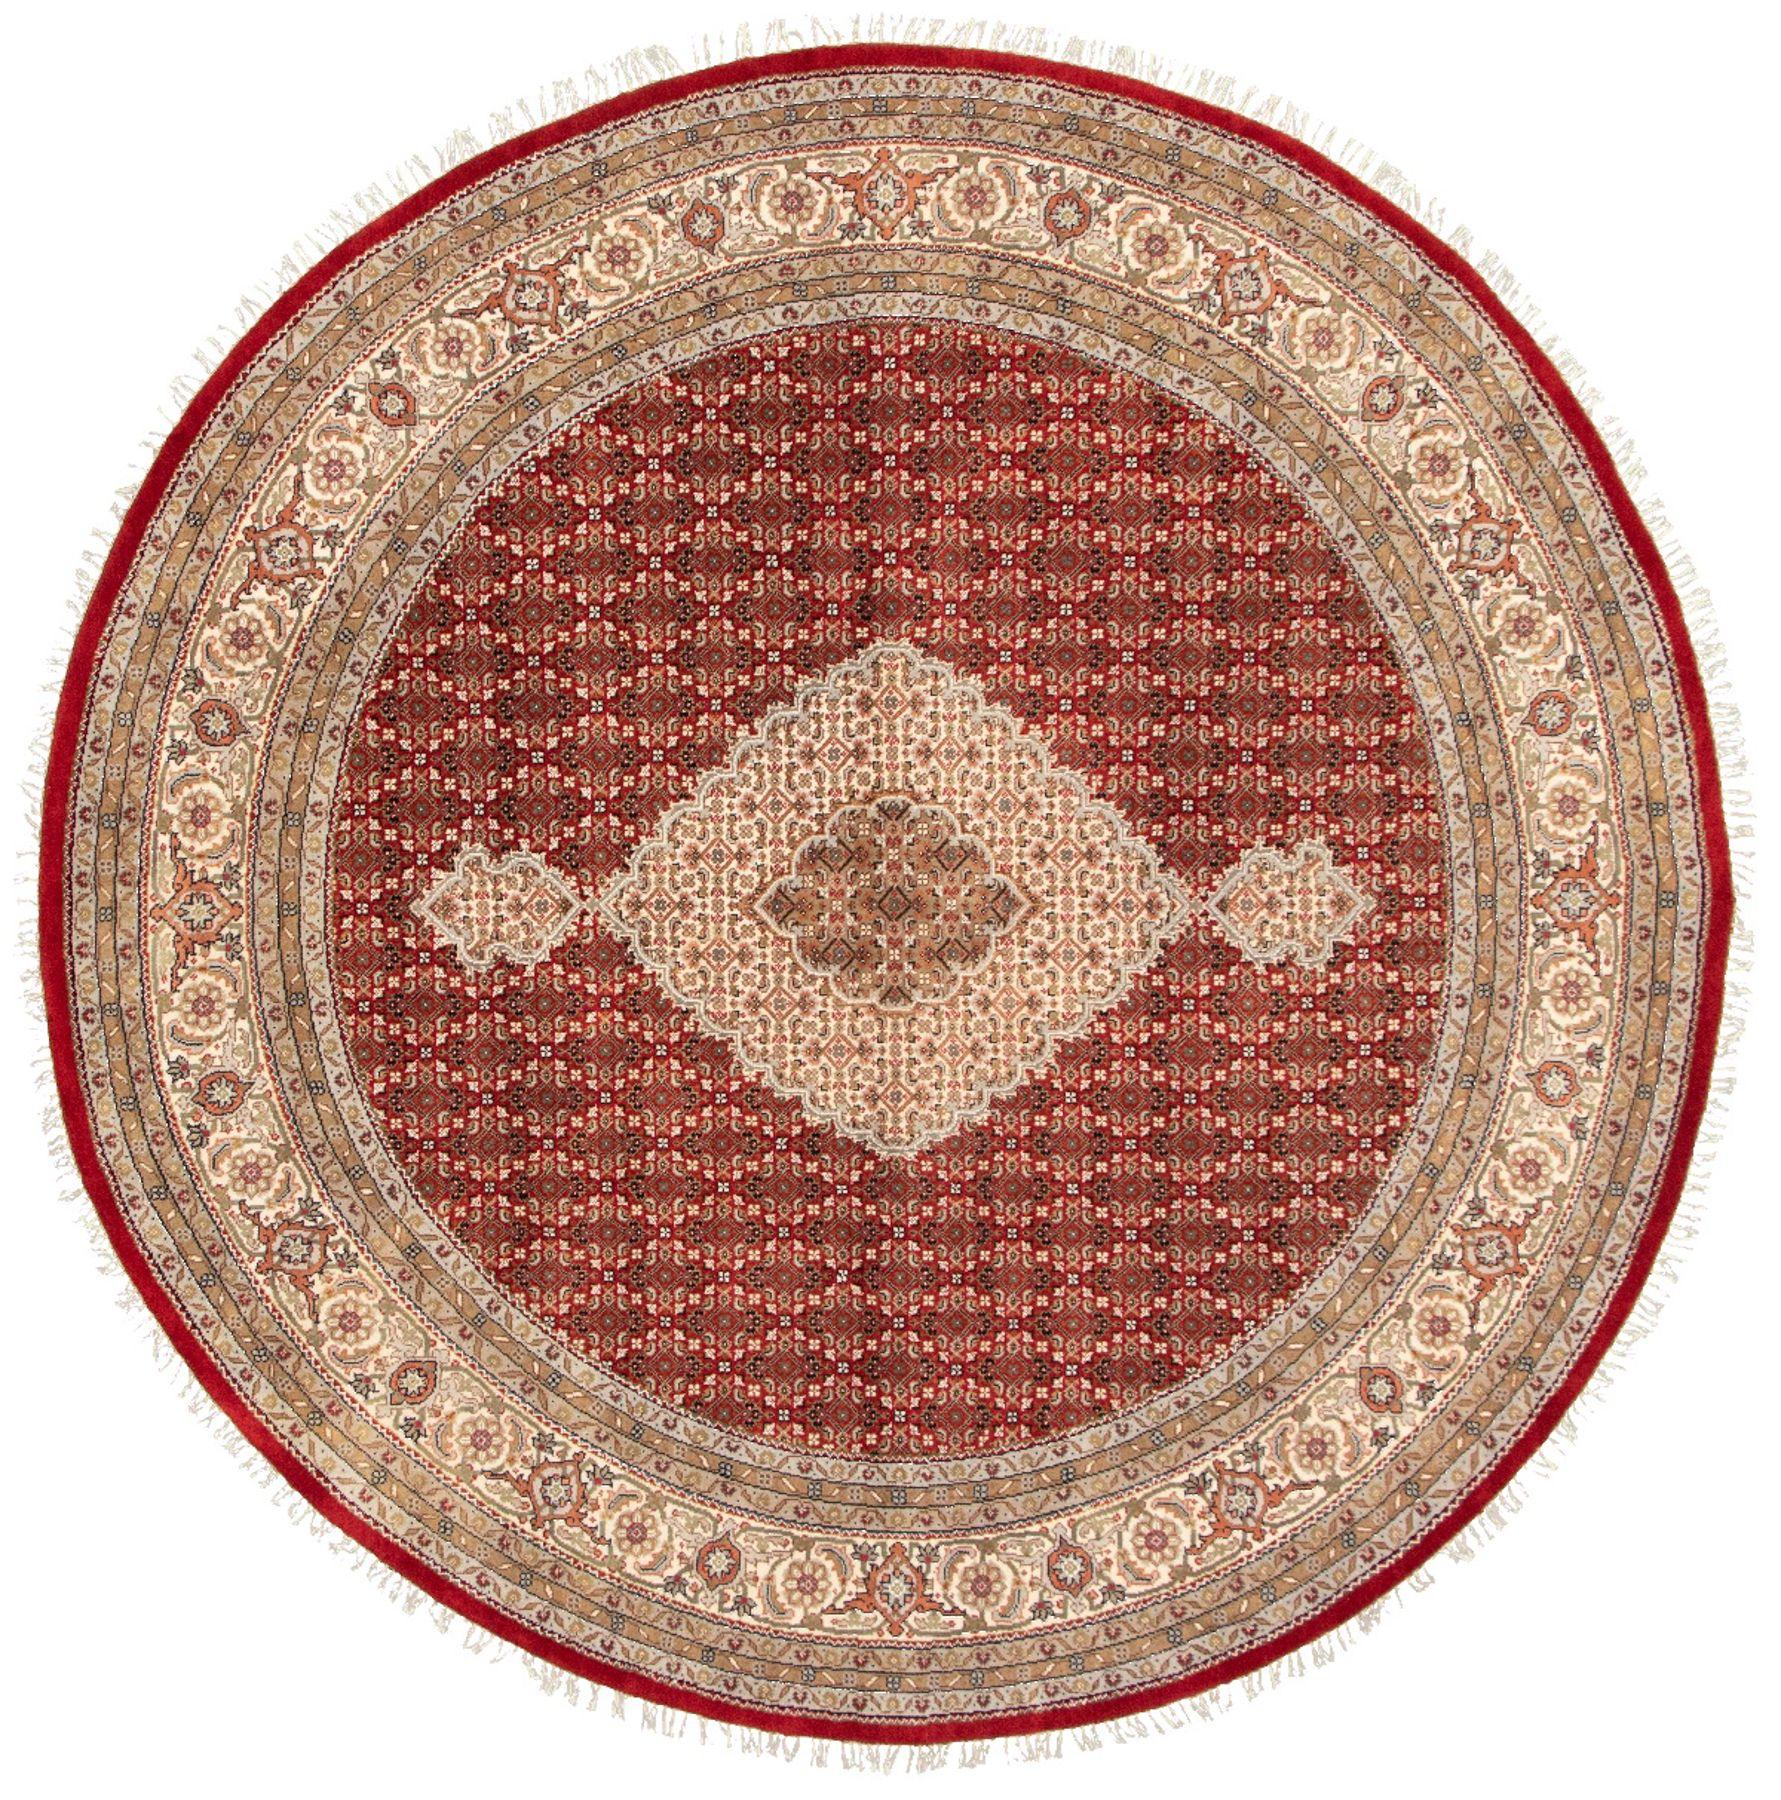 "Hand-knotted Tabriz Haj Jalili Red Wool Rug 8'4"" x 8'4"" Size: 8'4"" x 8'4"""